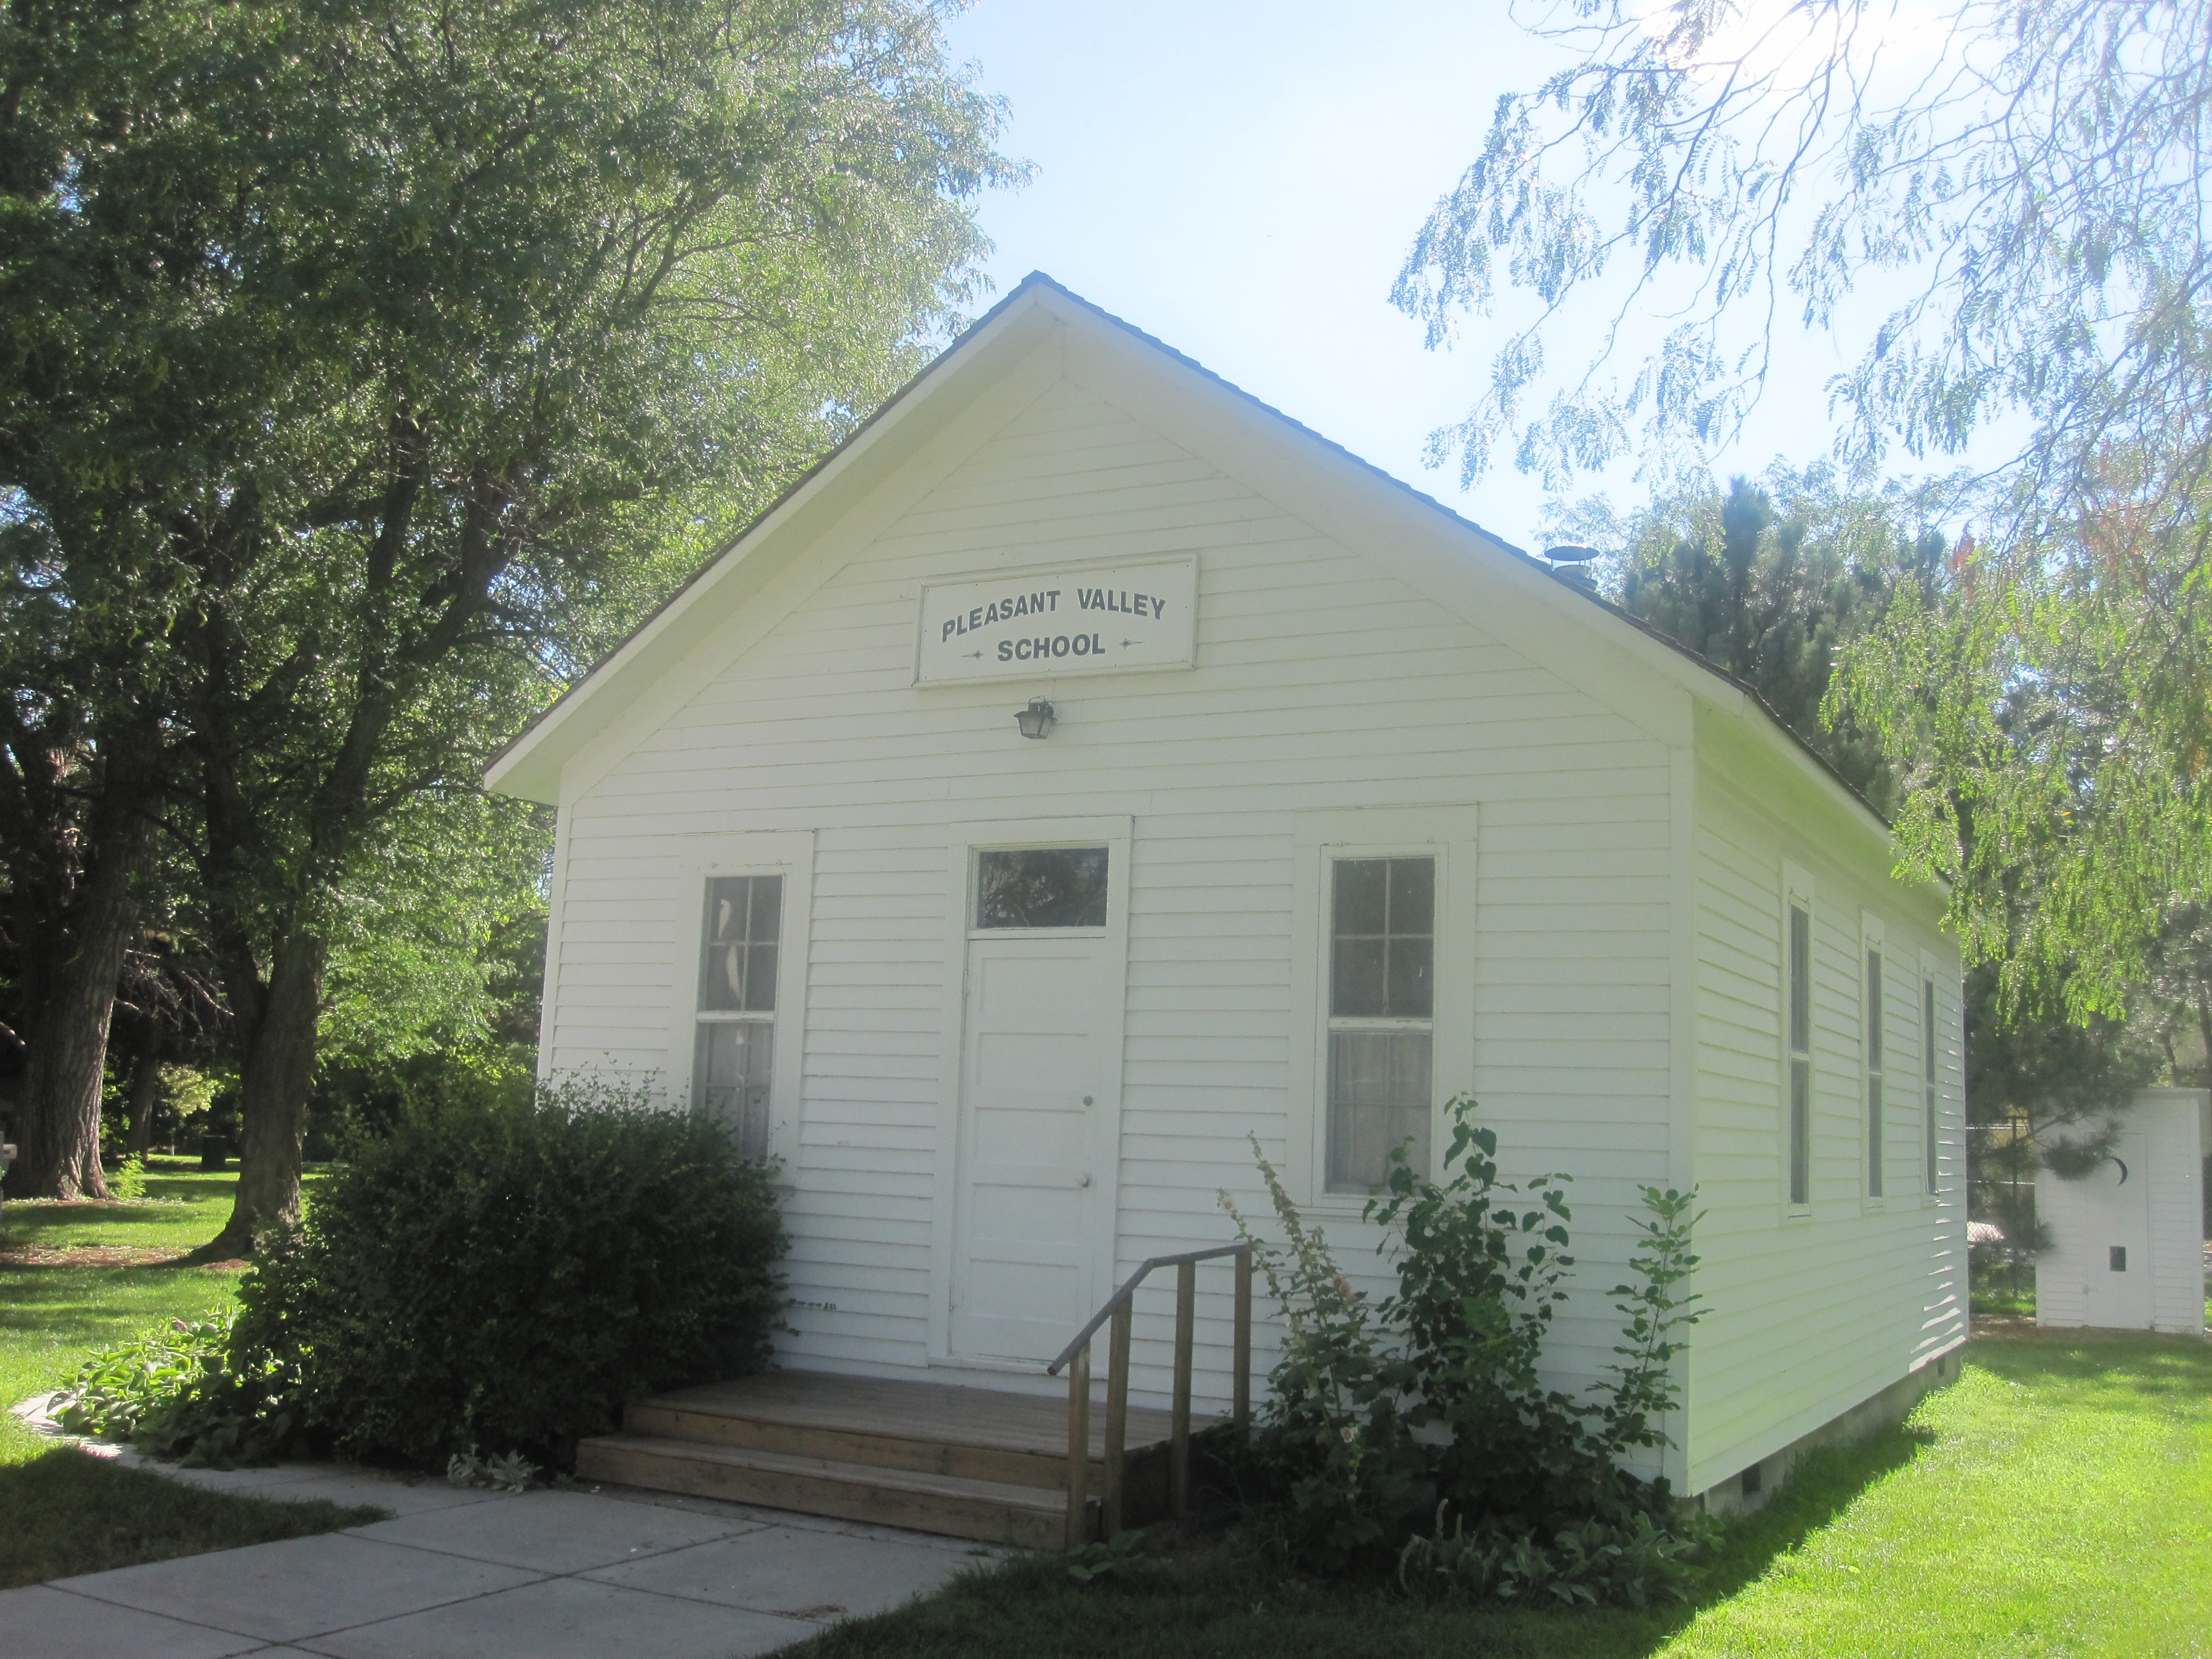 File:Pleasant Valley School, Garden City, KS IMG 5928.JPG ...